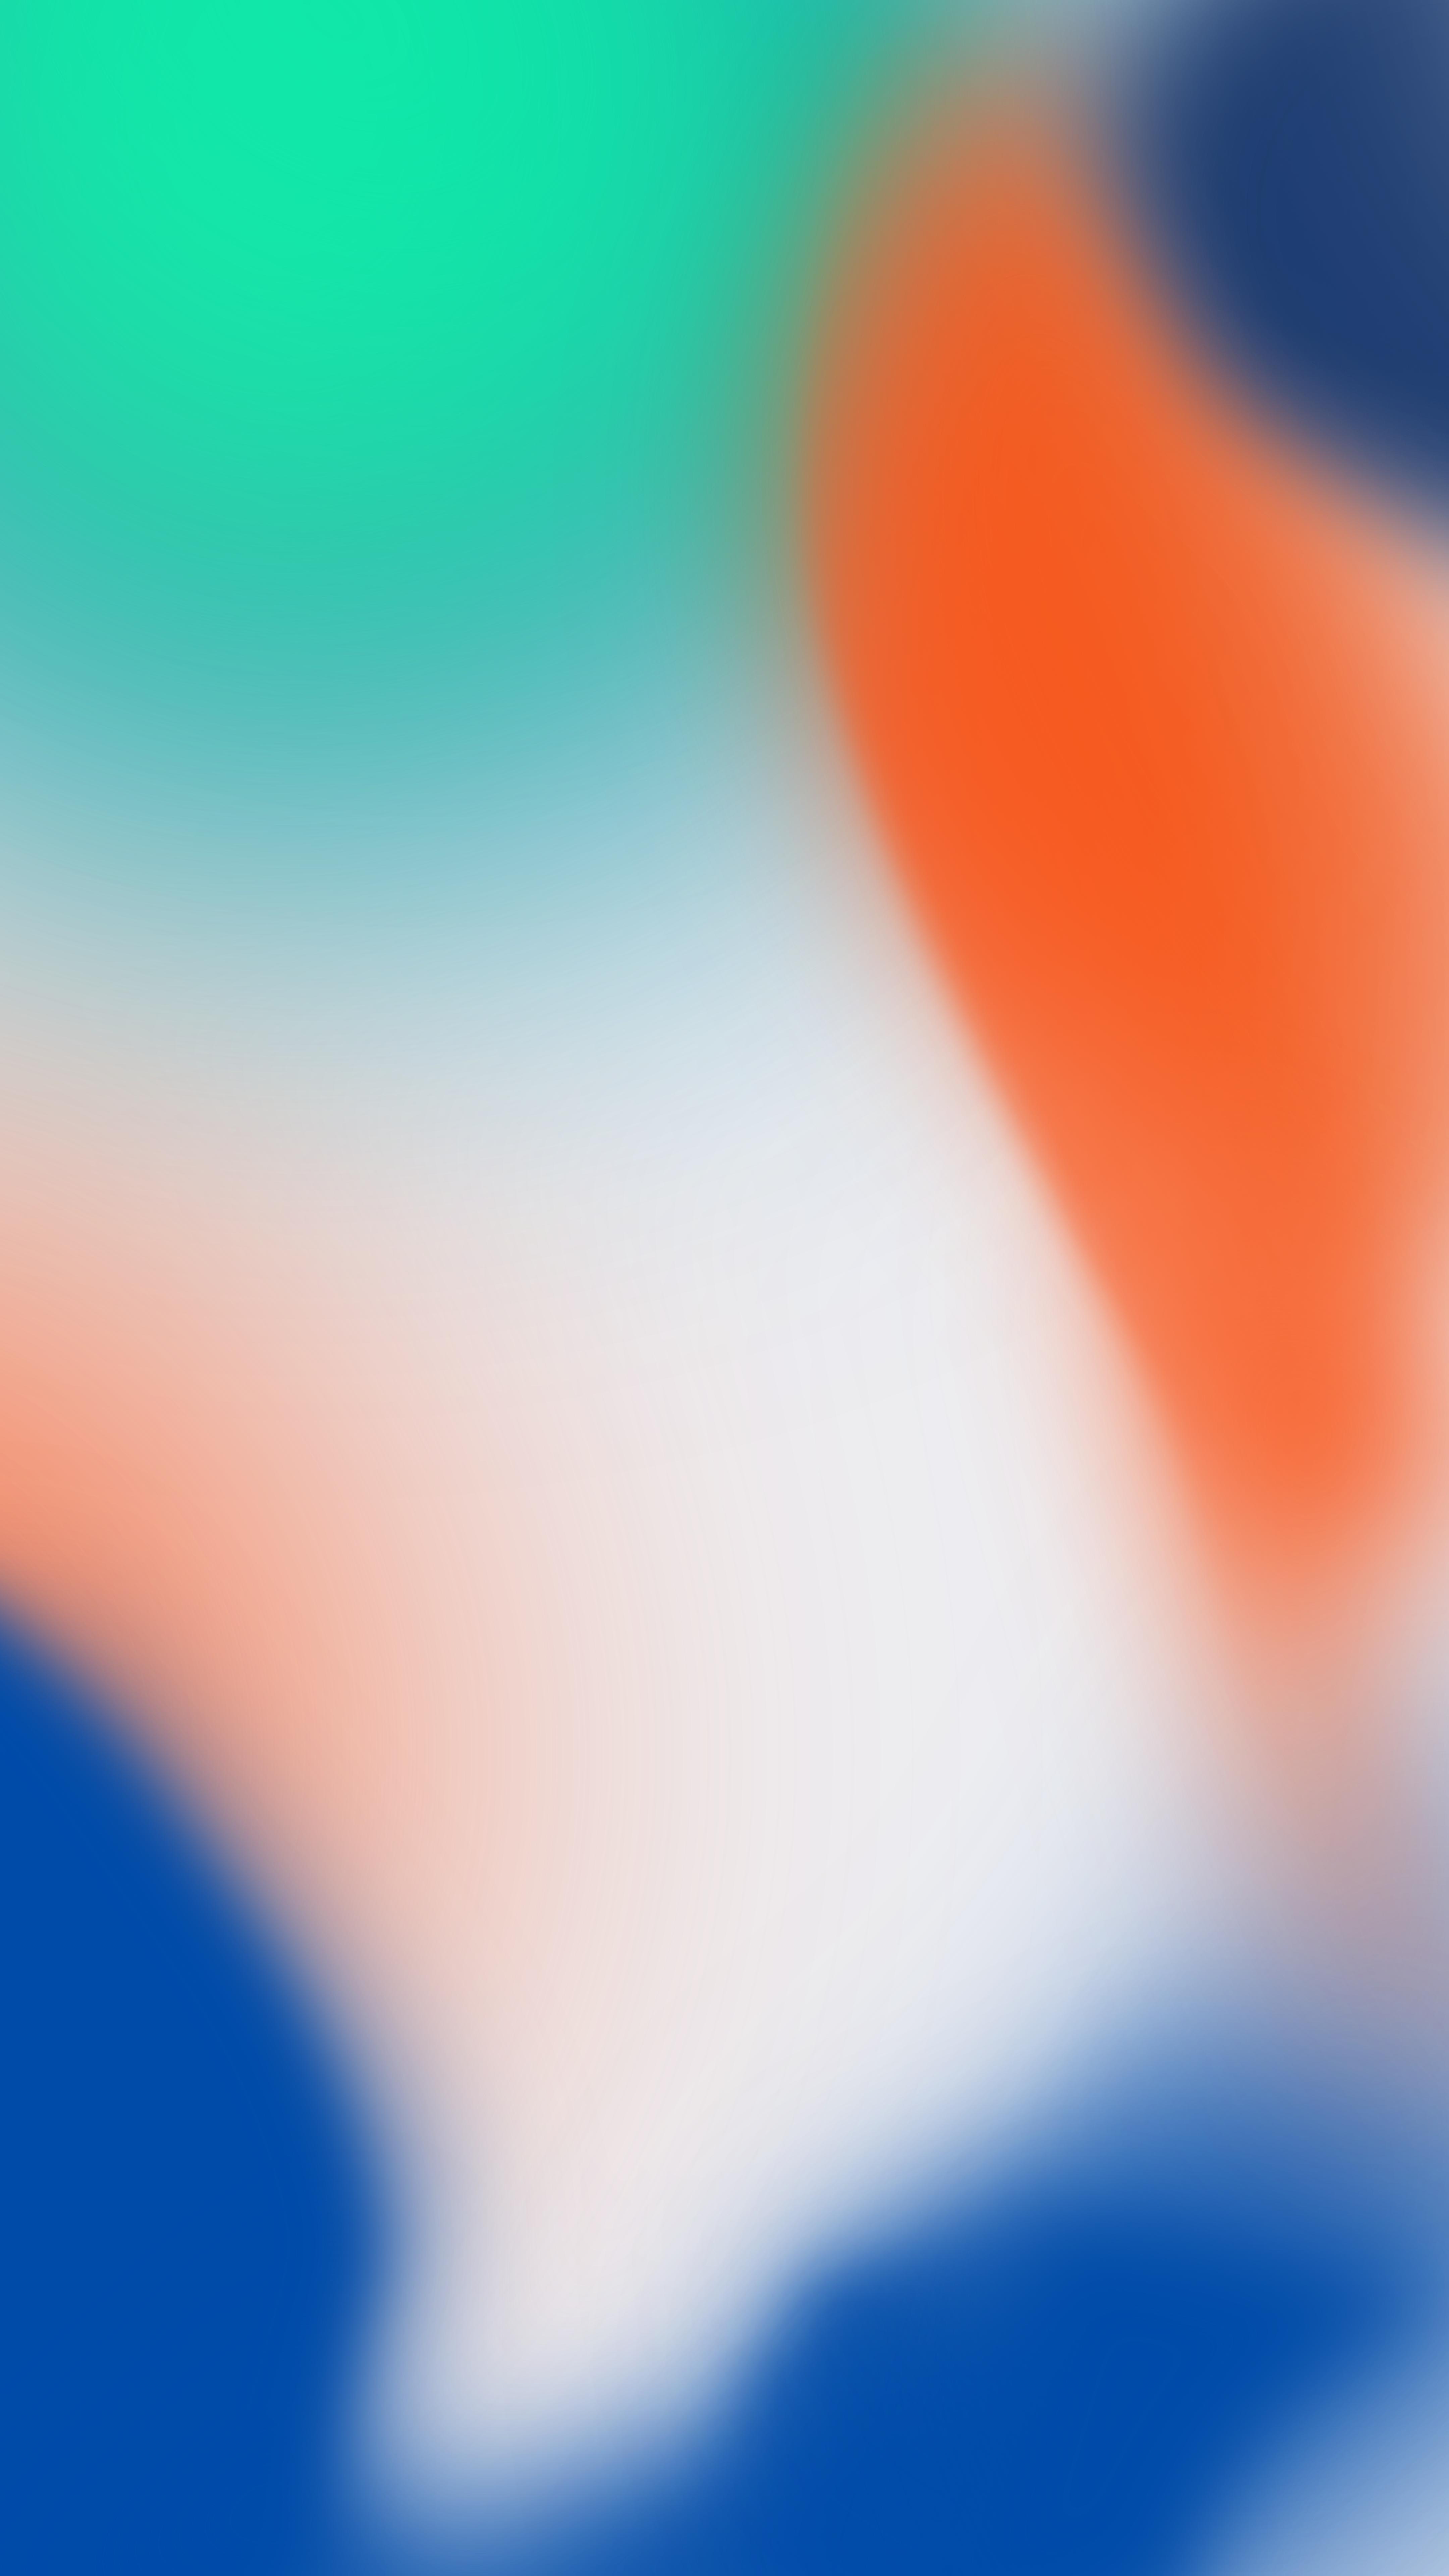 iPhone X Wallpaper Green/Orange/Blue